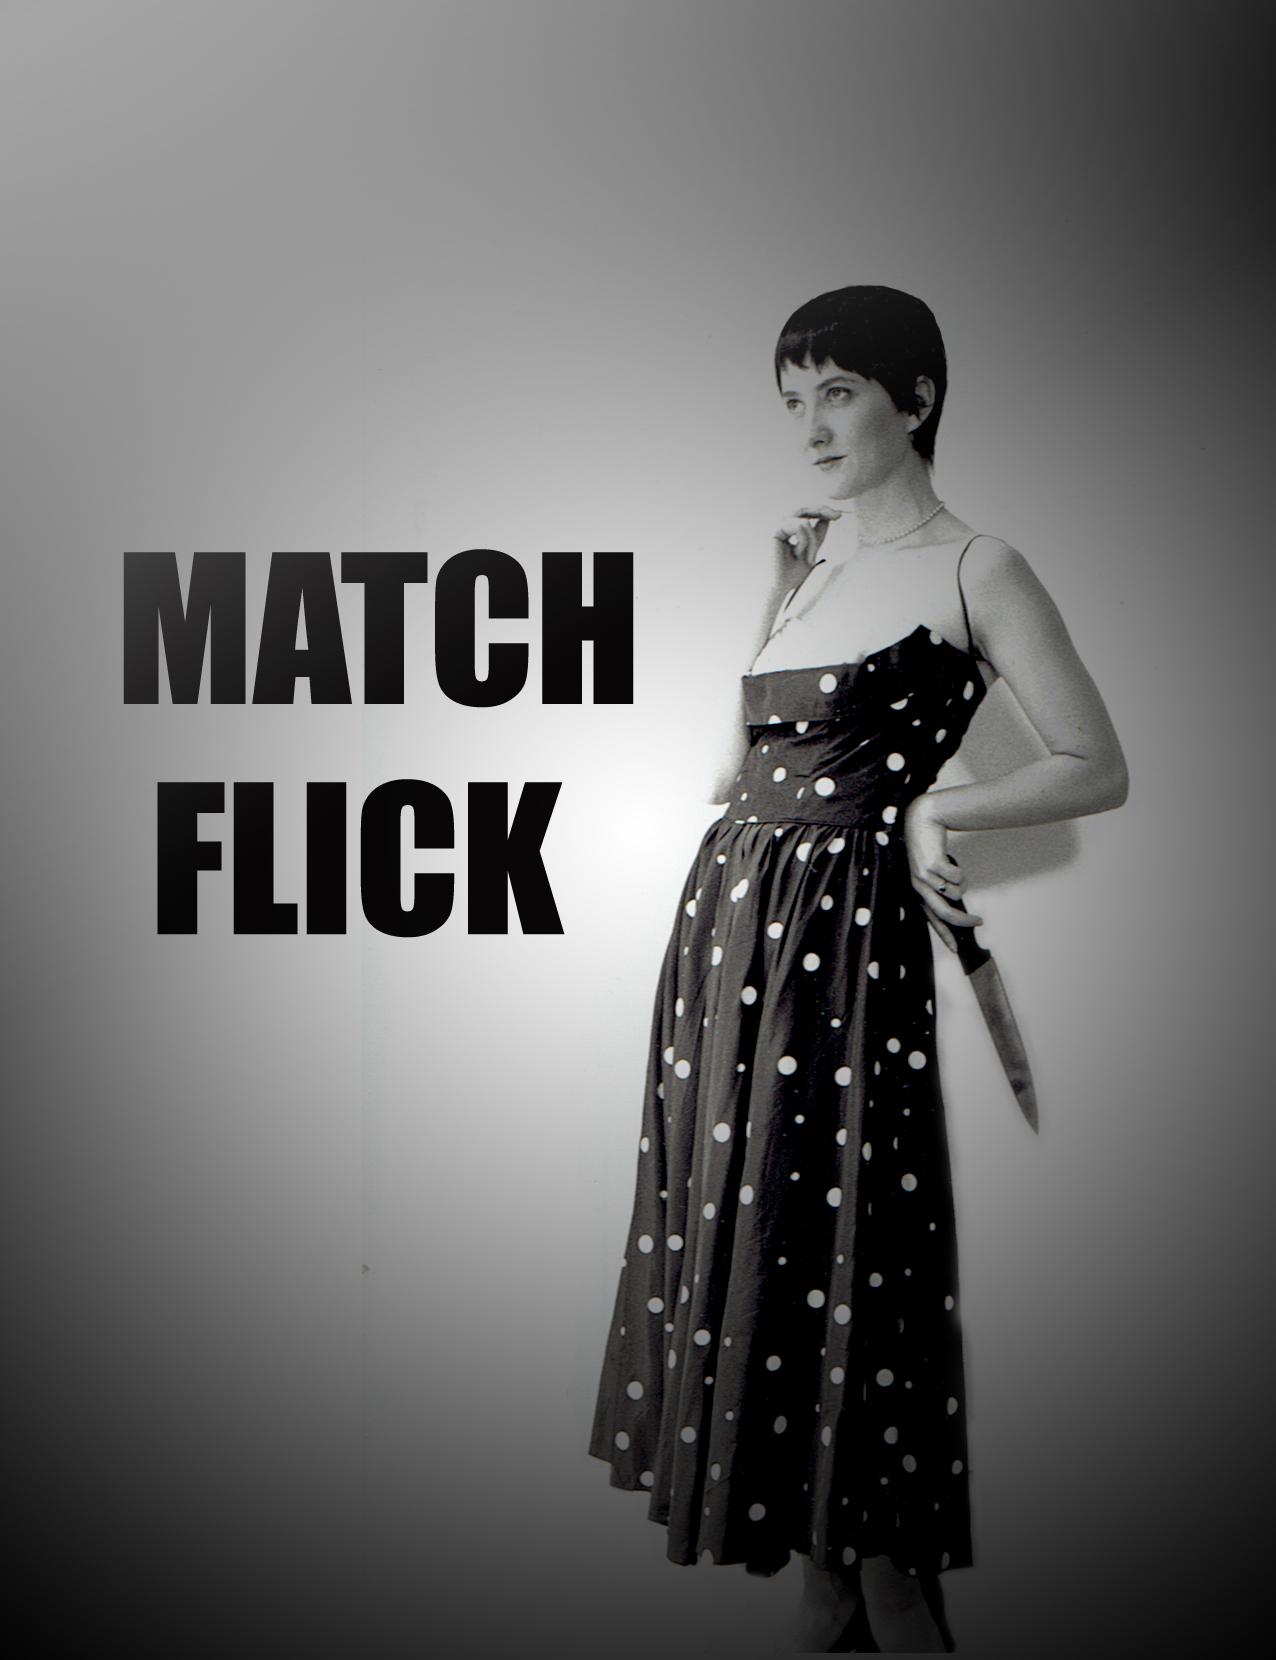 MATCH FLICK